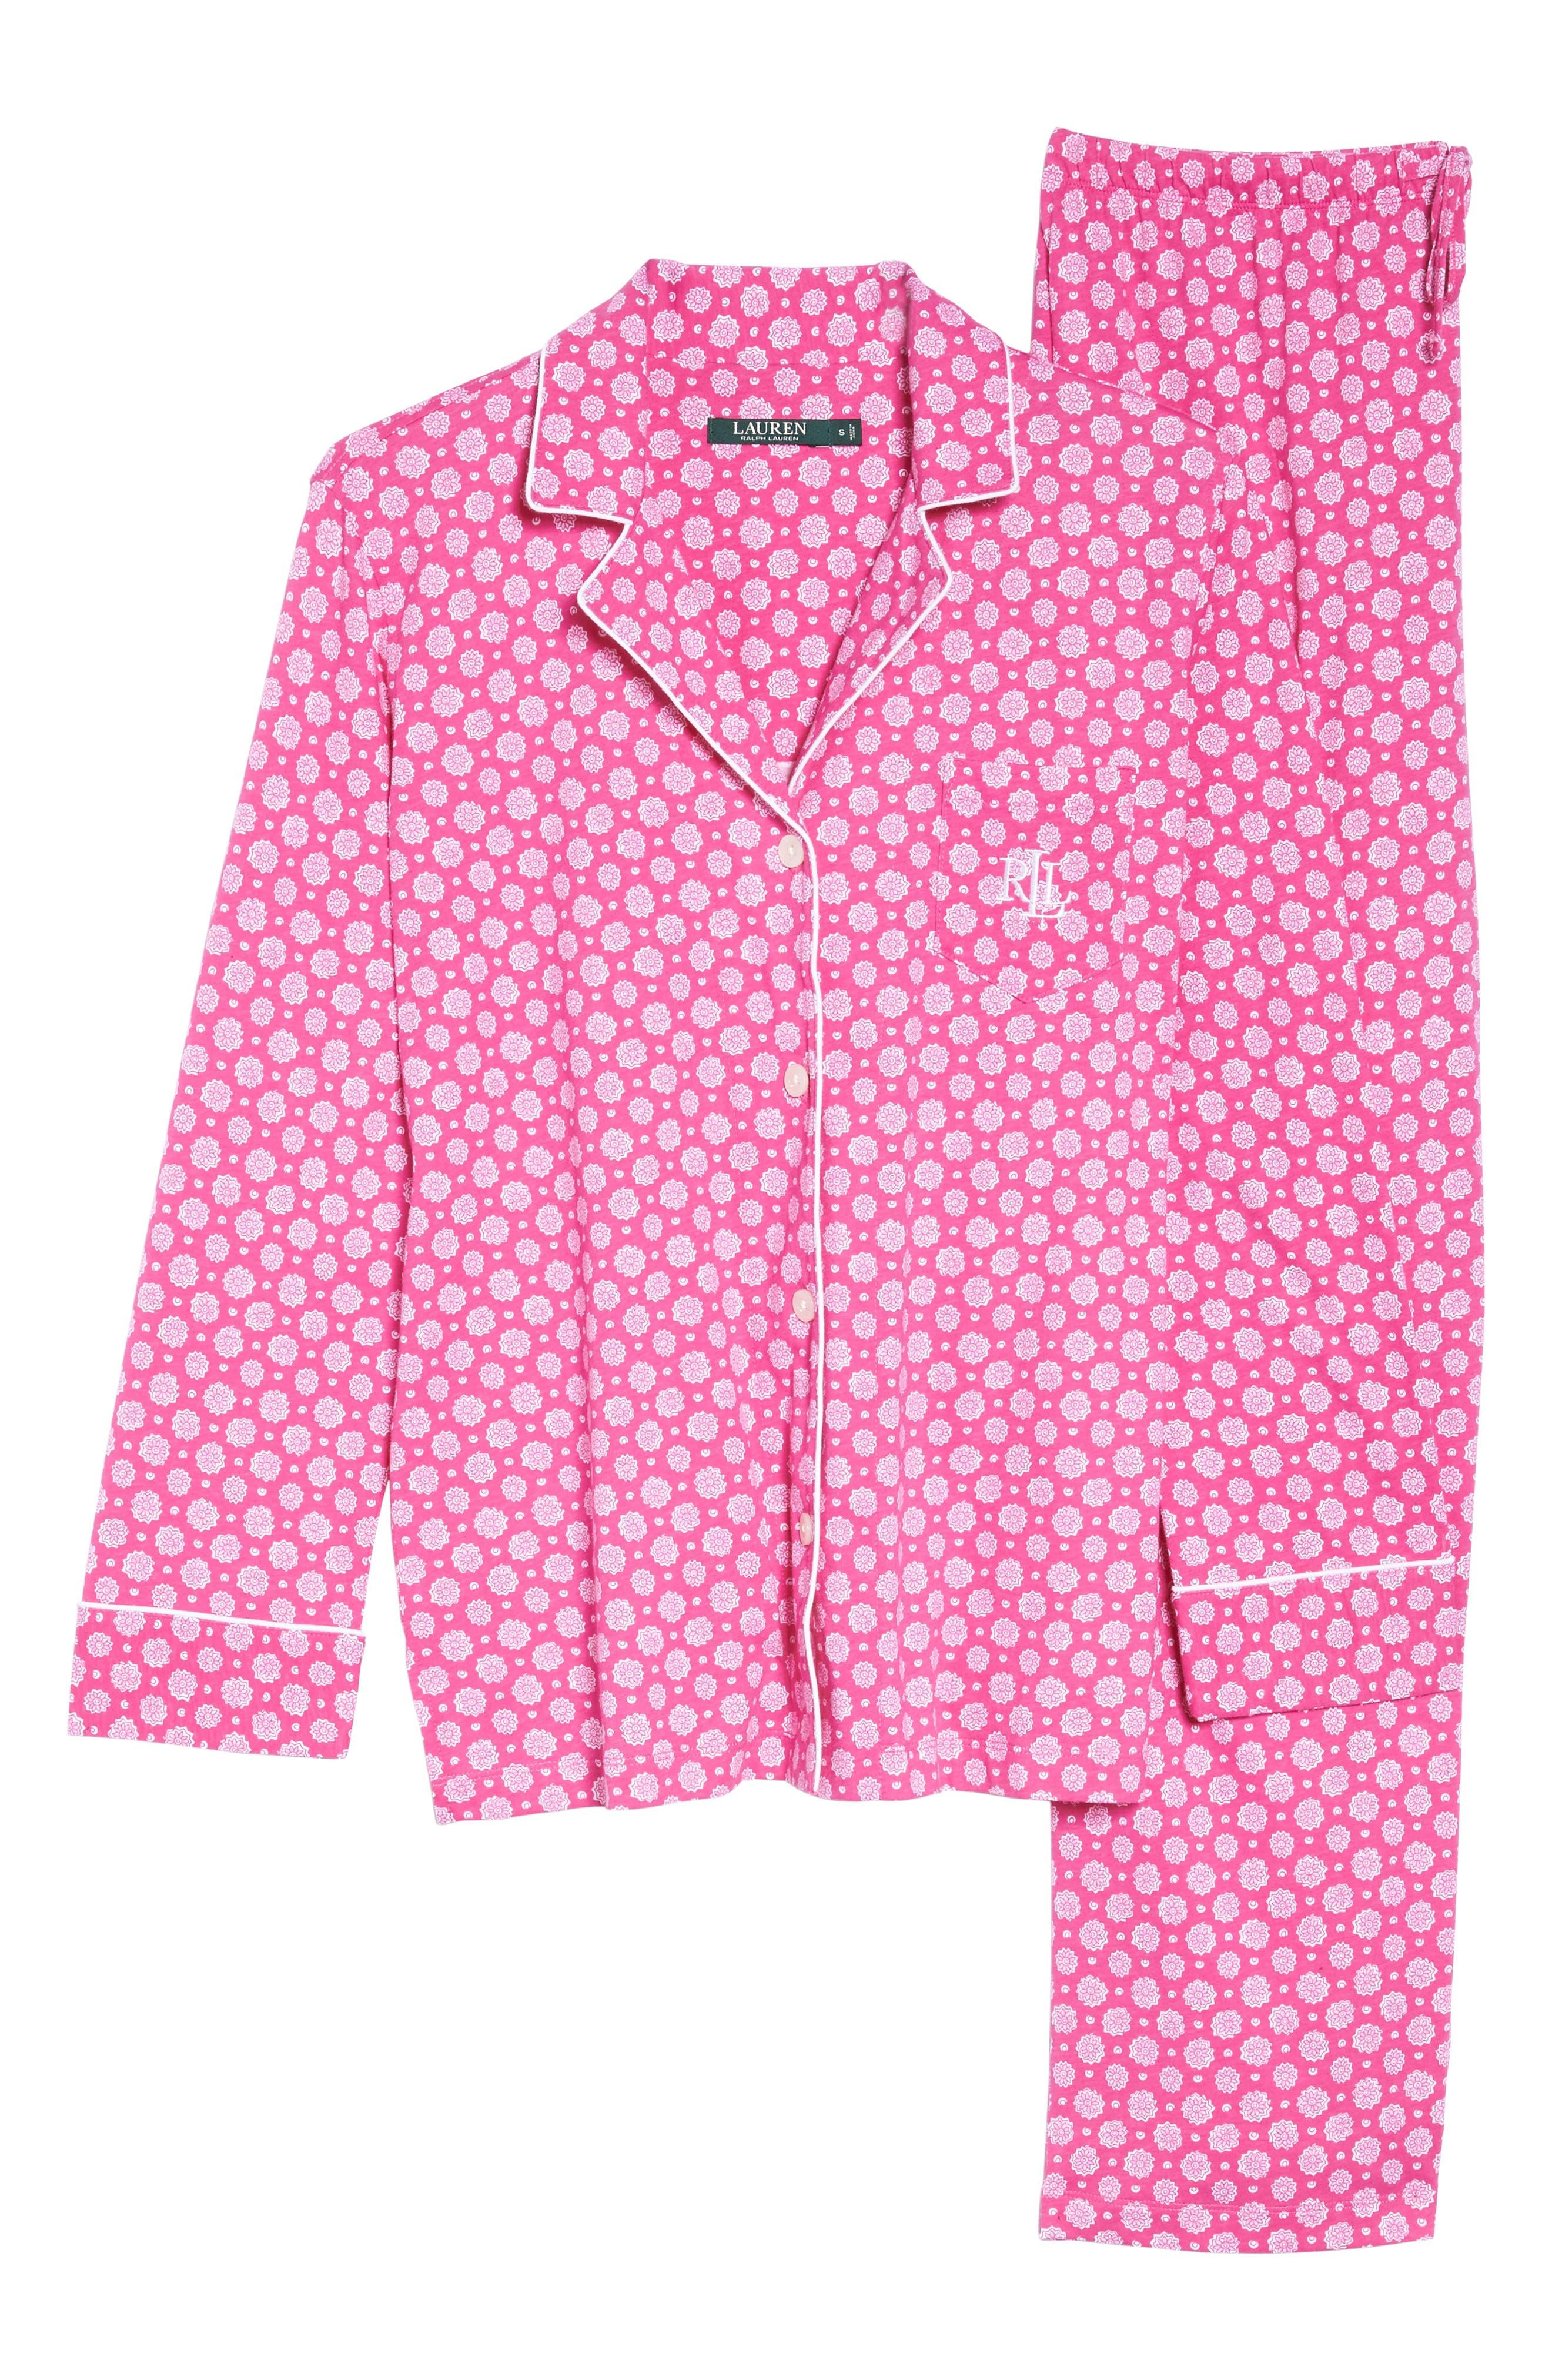 Notch Collar Pajamas,                             Alternate thumbnail 6, color,                             Pink Floral